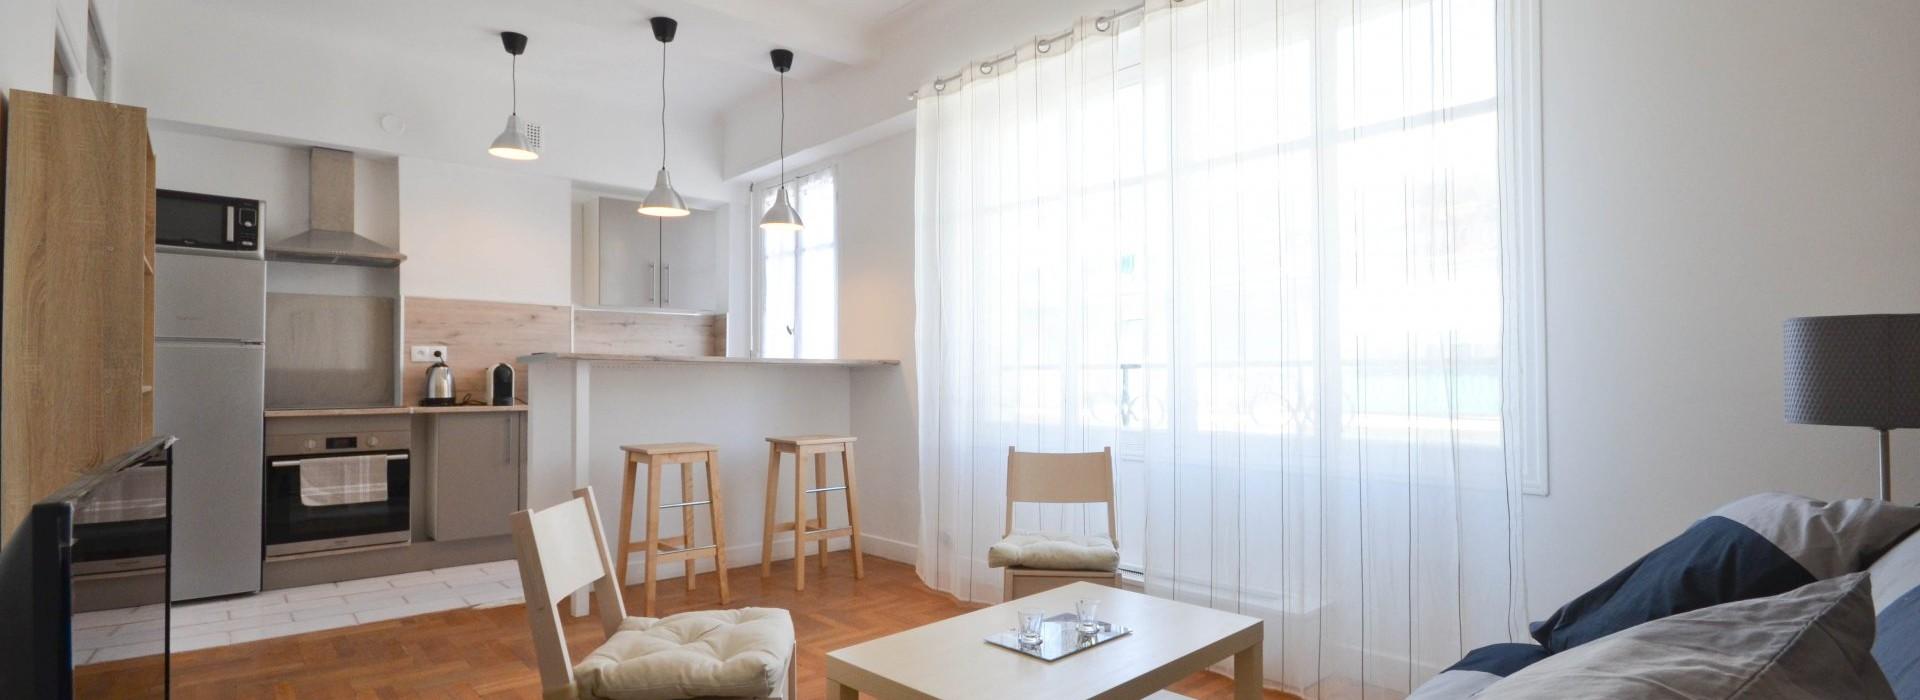 Appartement Nice 1 Pièce 30m2 195,000€